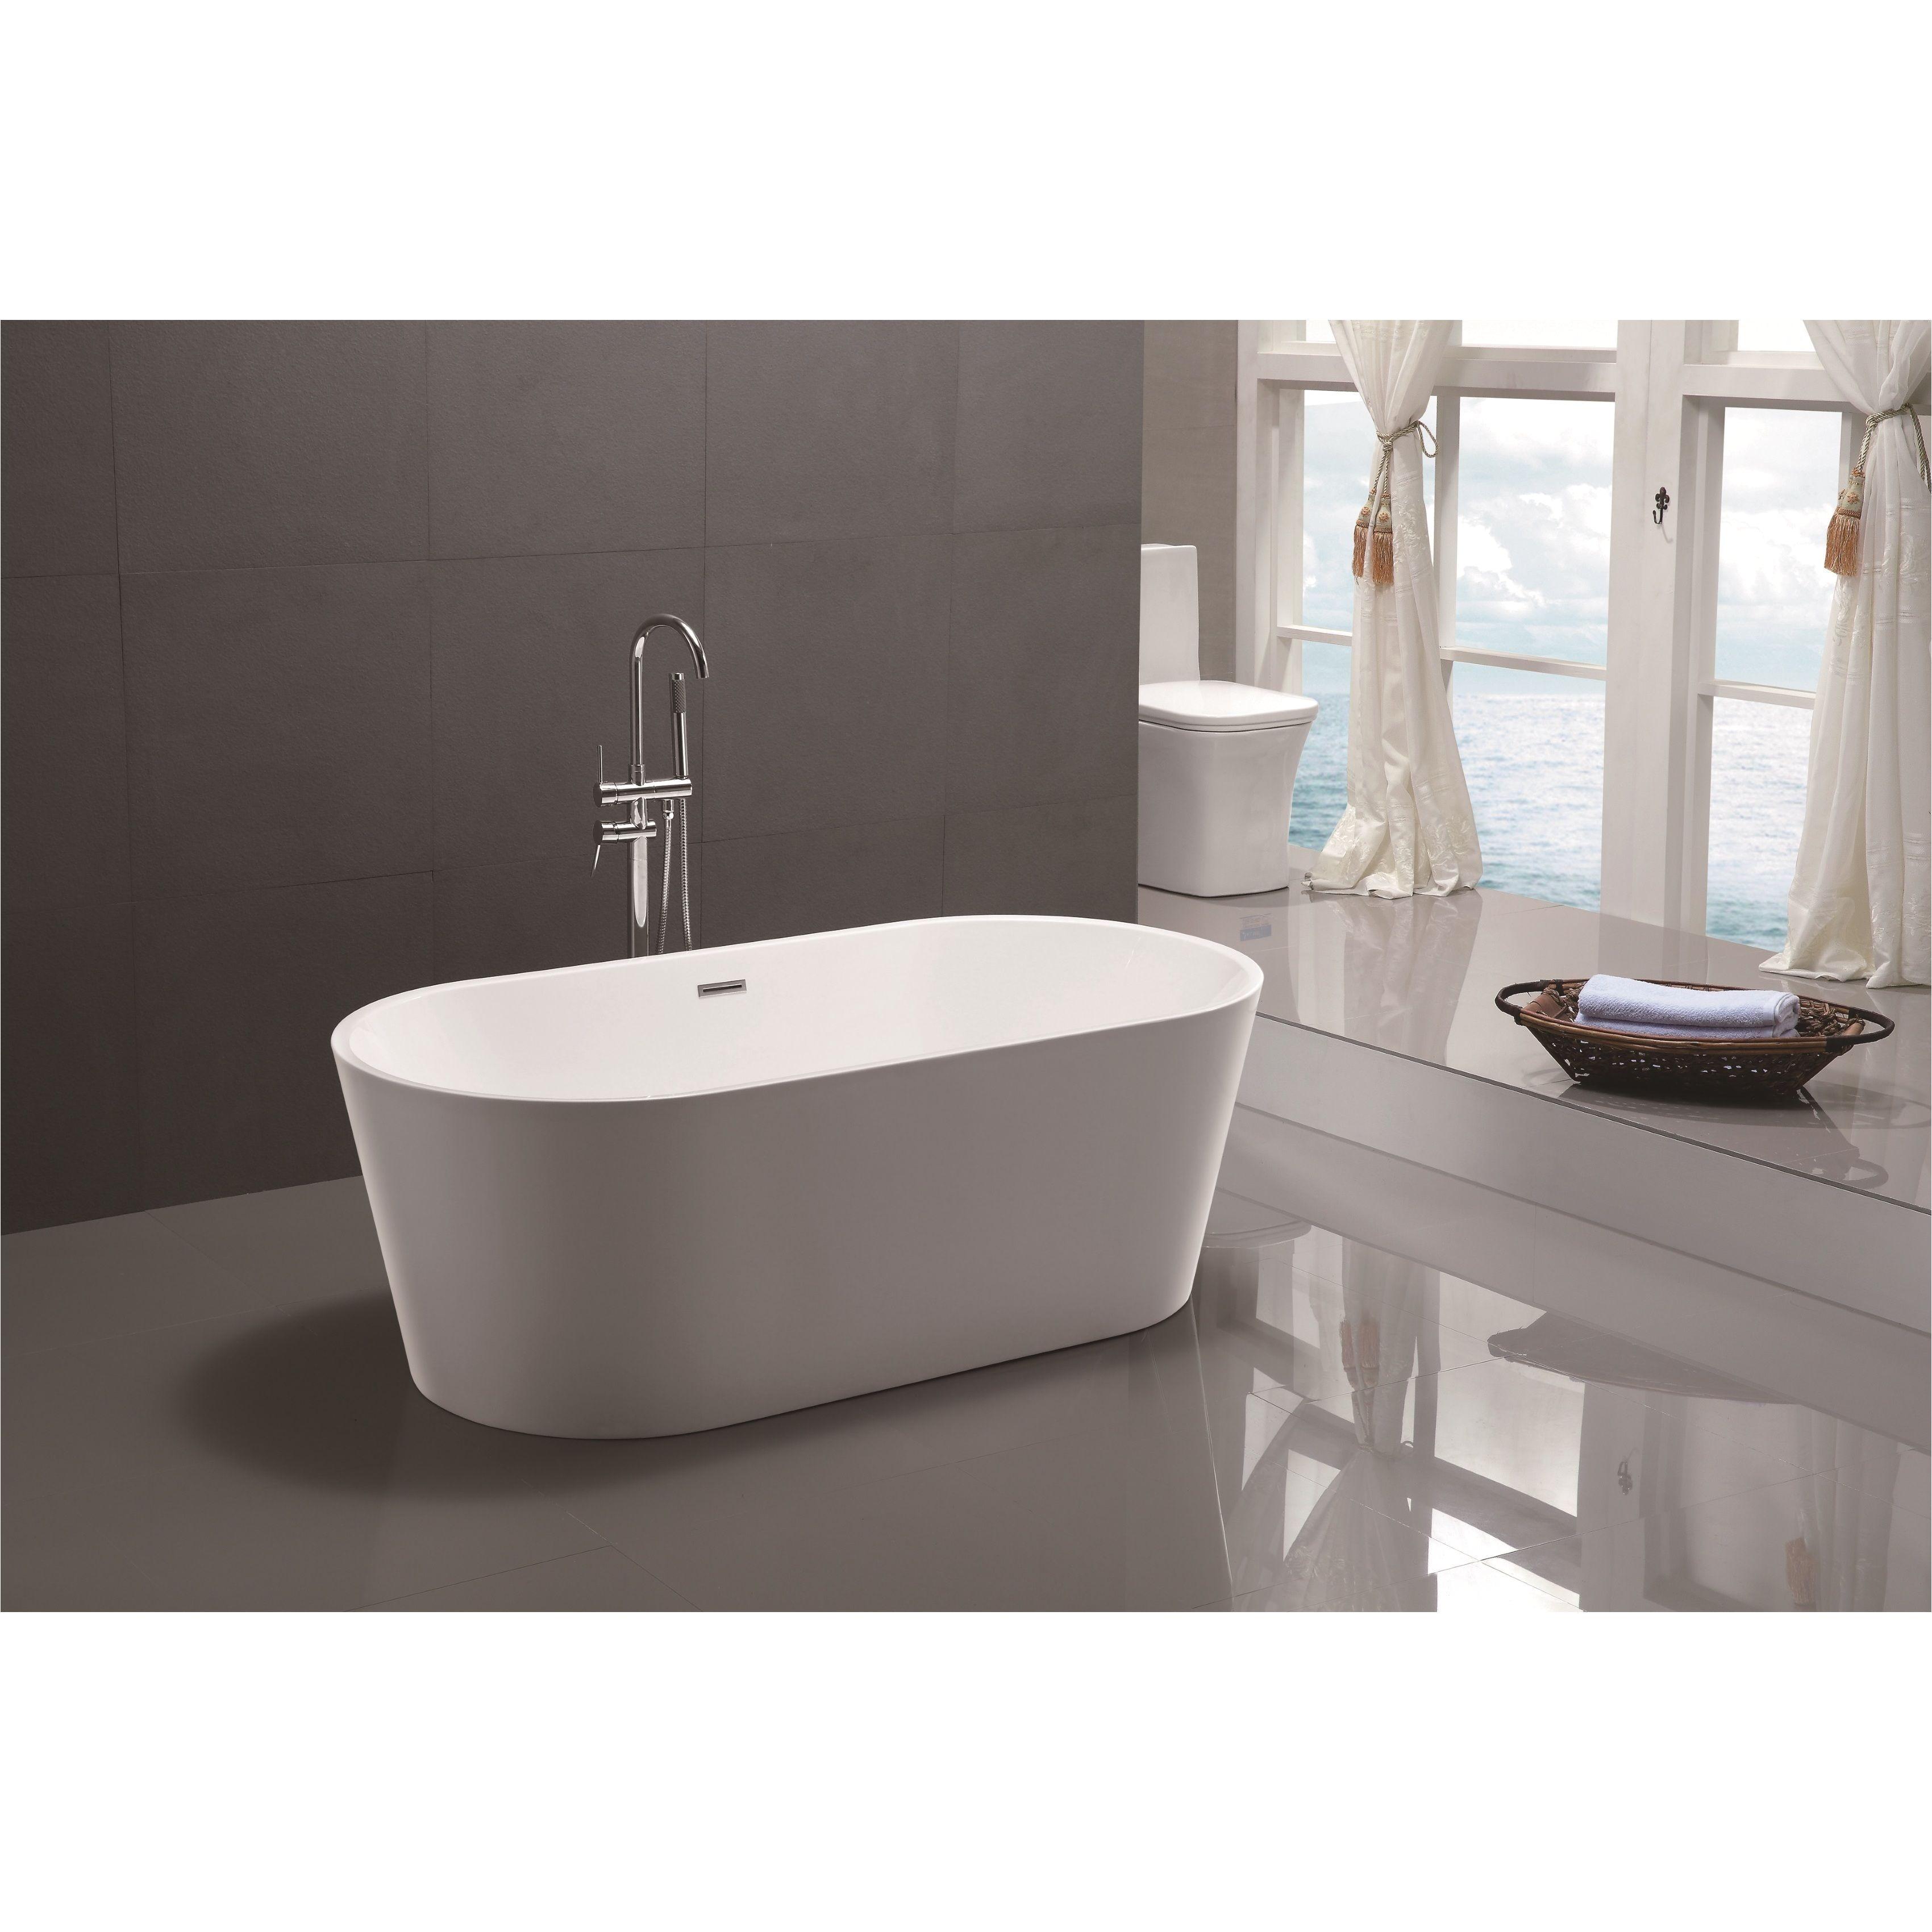 modern bathtubs lovely vanity art 59 inch freestanding soaking bathtub